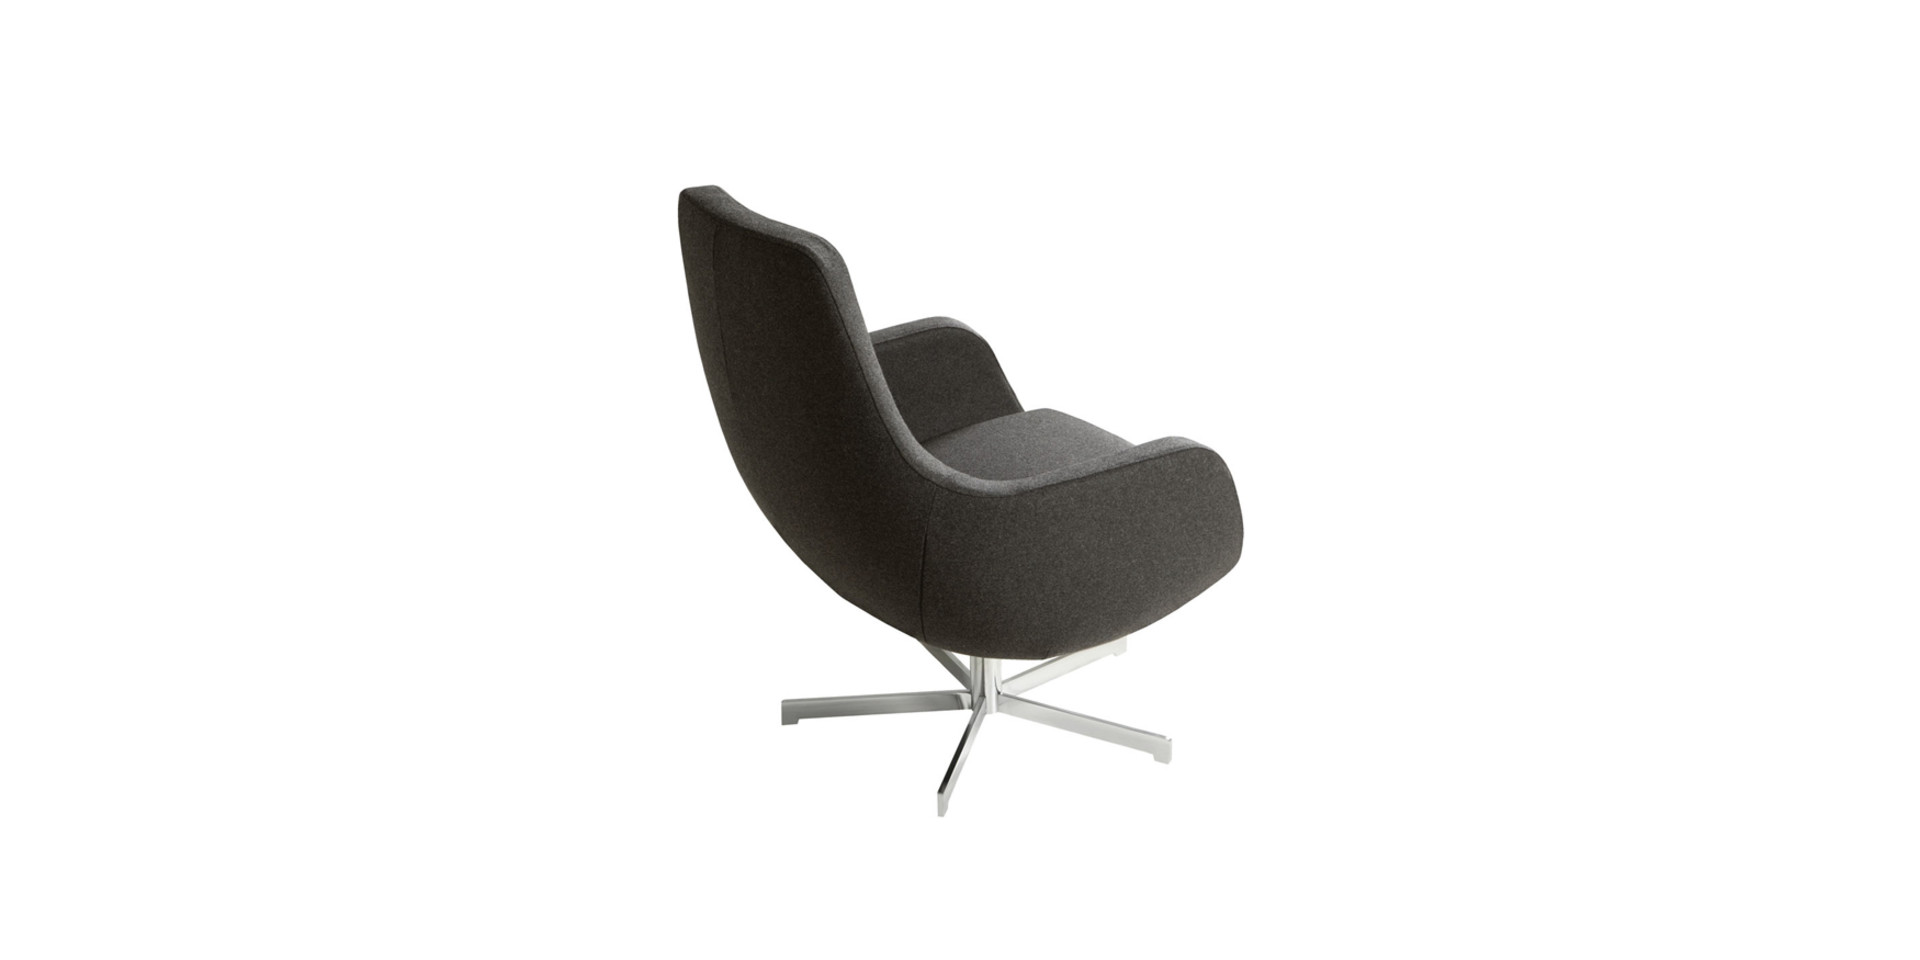 sits-stefani-fauteuil-swivel_panno1002_charcoal_6